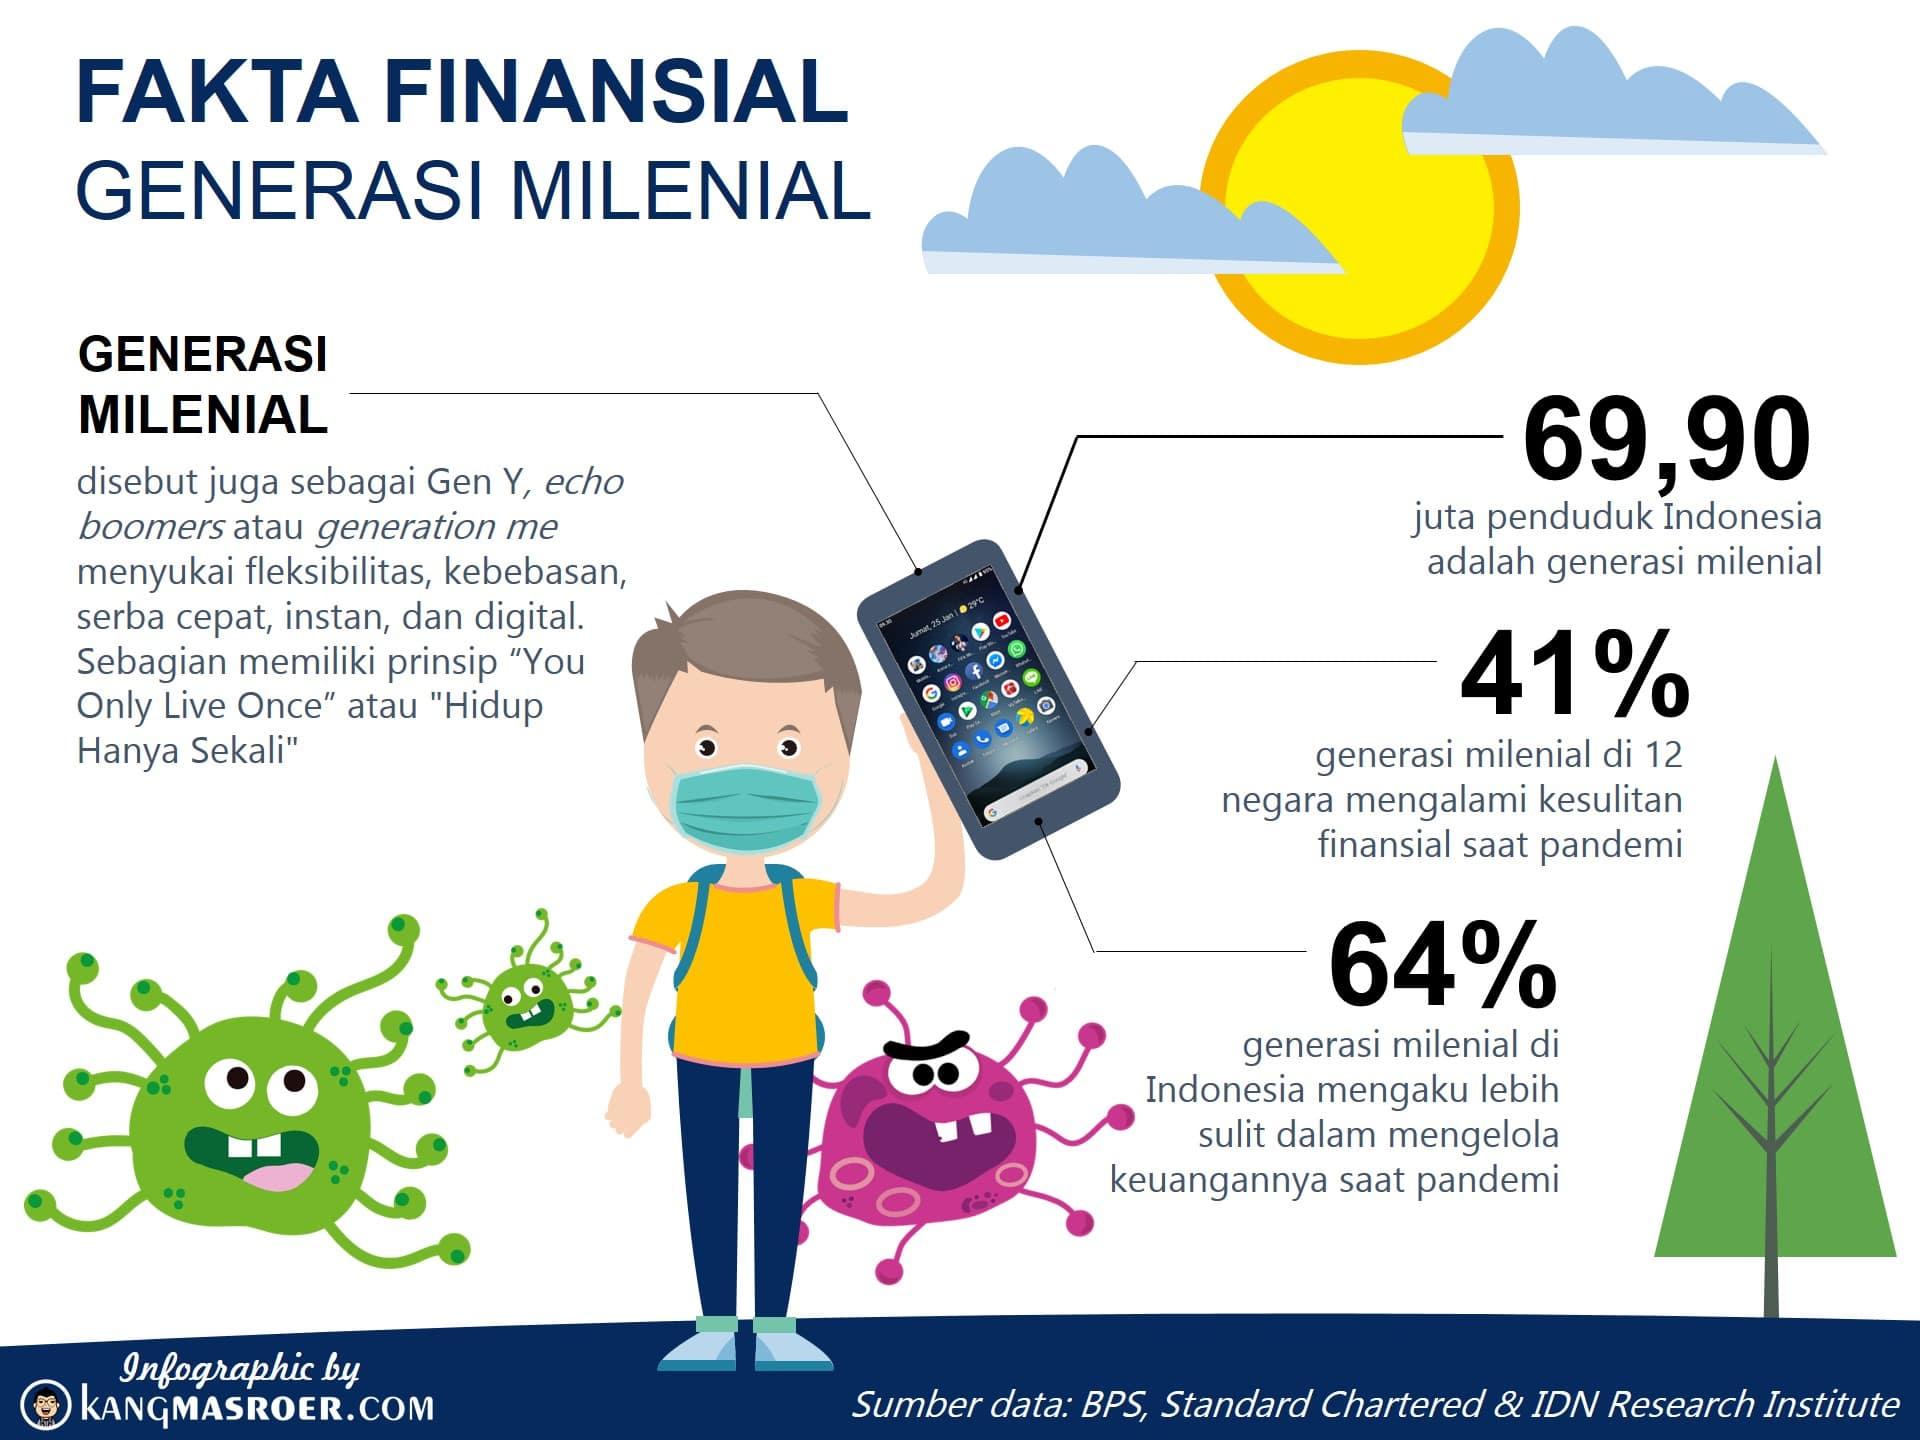 Fakta Finansial Generasi Milenial